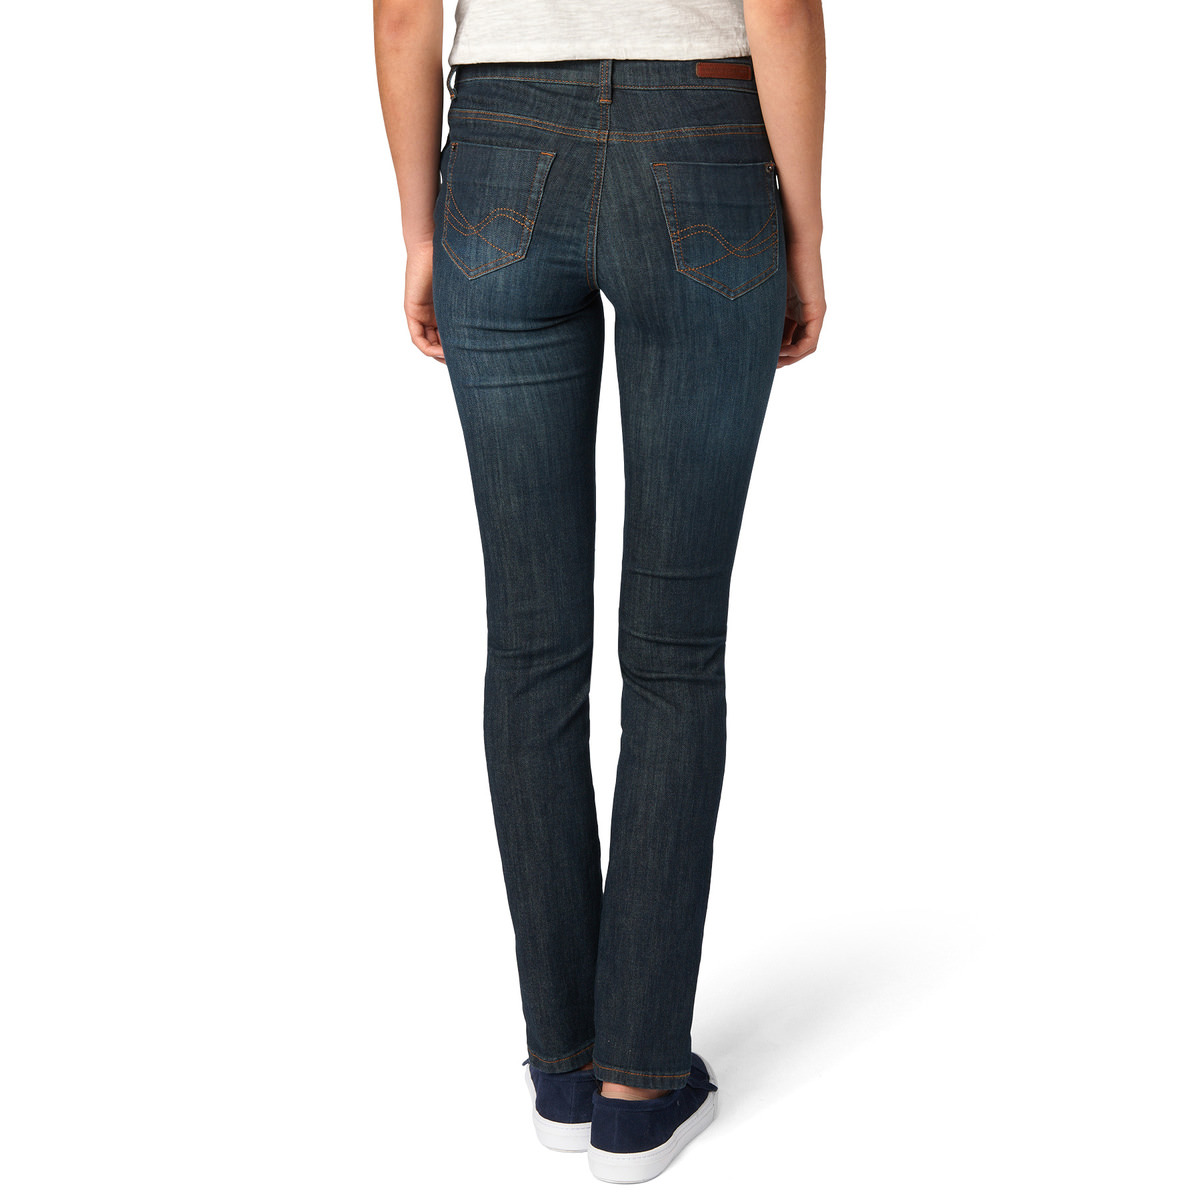 Slim Fit-Jeans Orlando, 34 Inch in dark blue stone washed